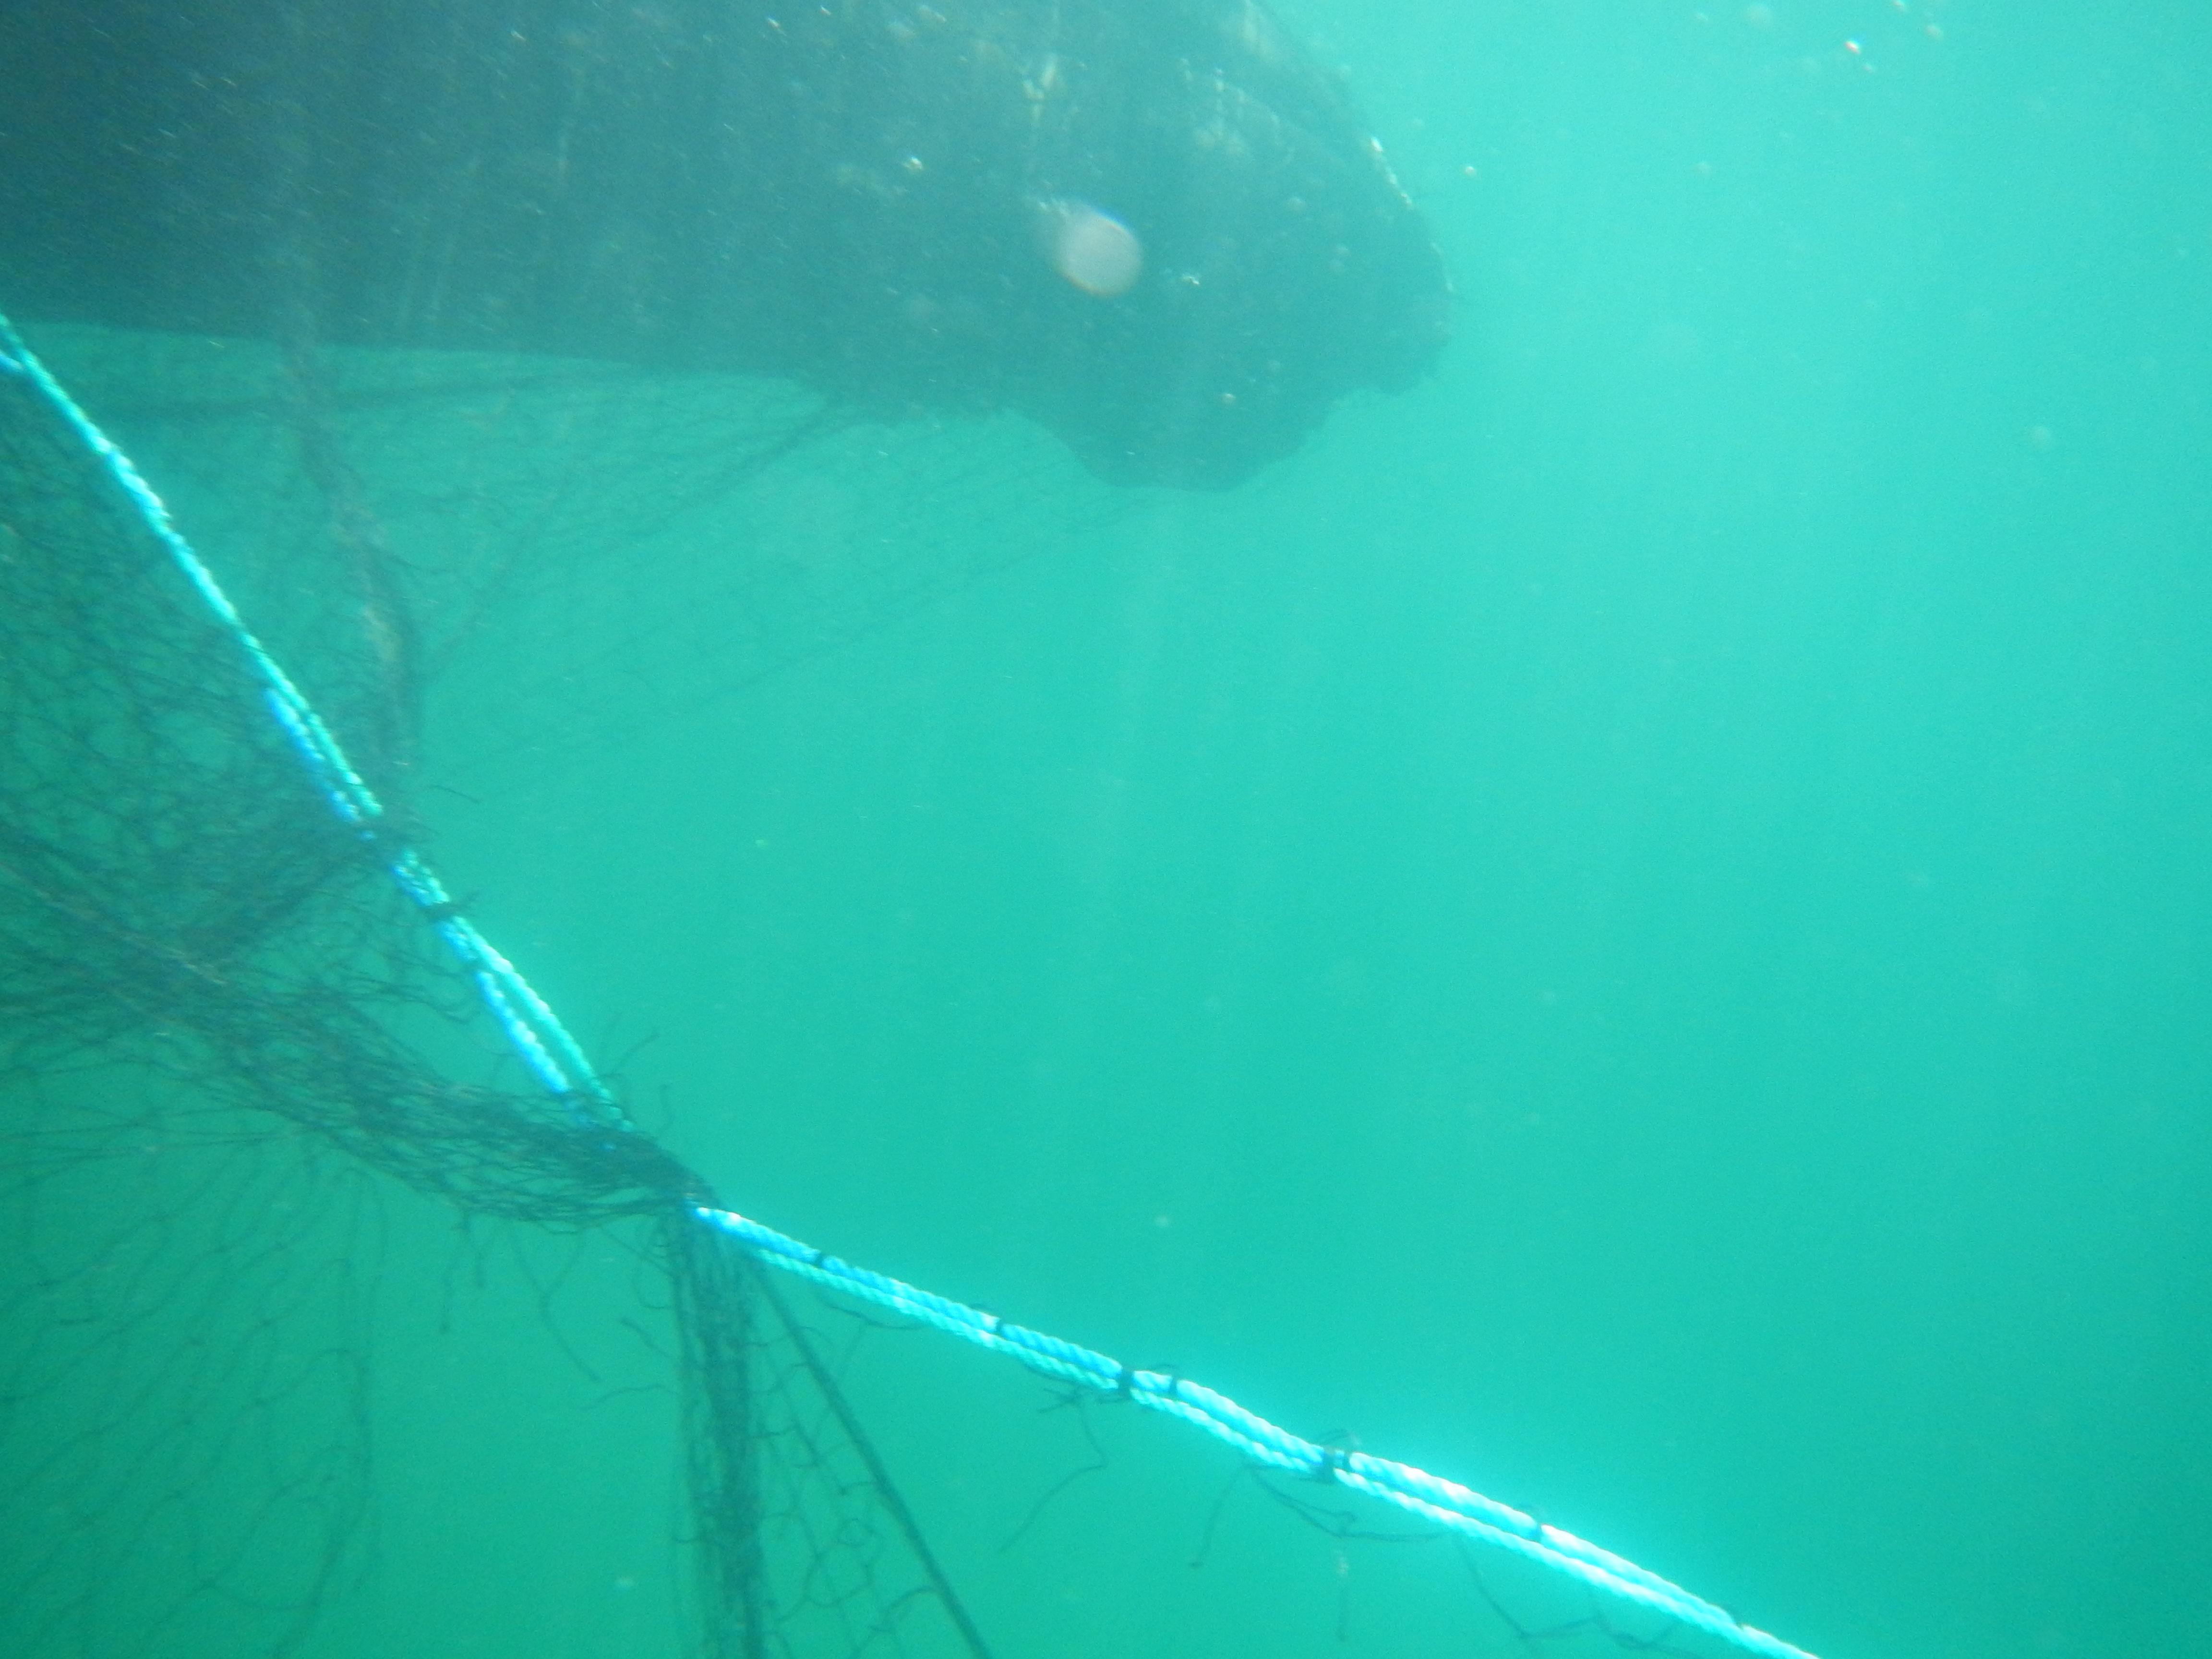 netting on head